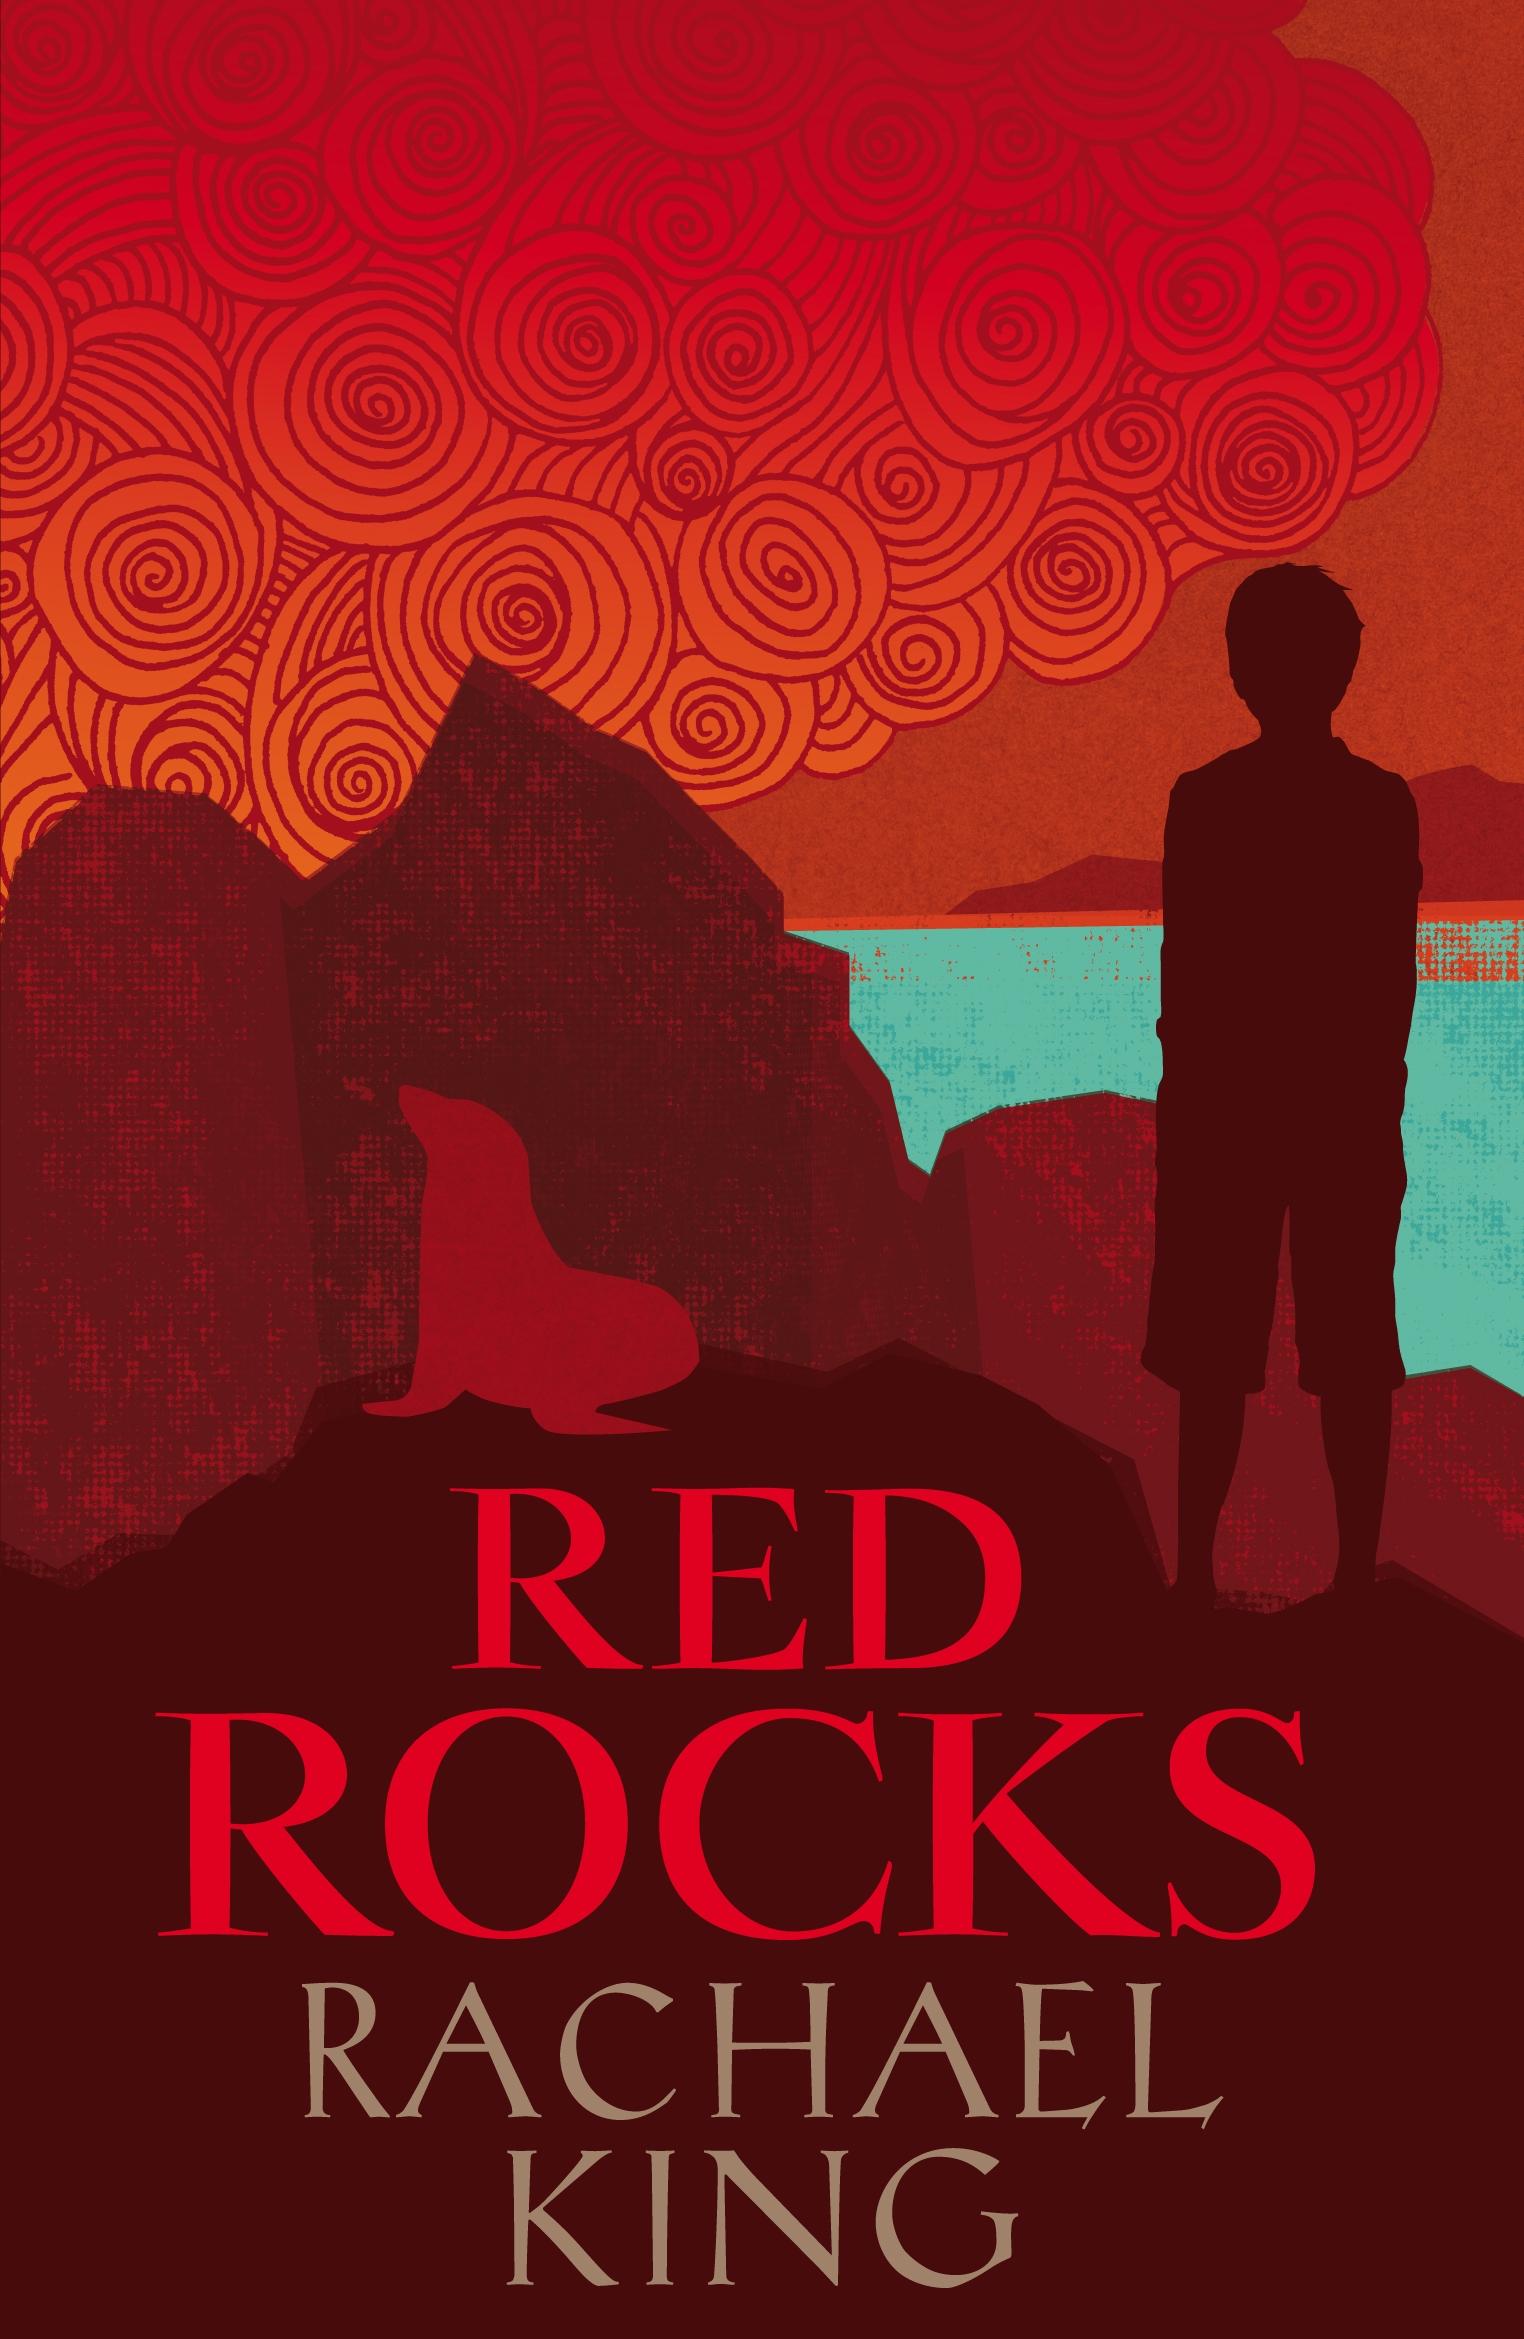 Image result for red rocks king book image